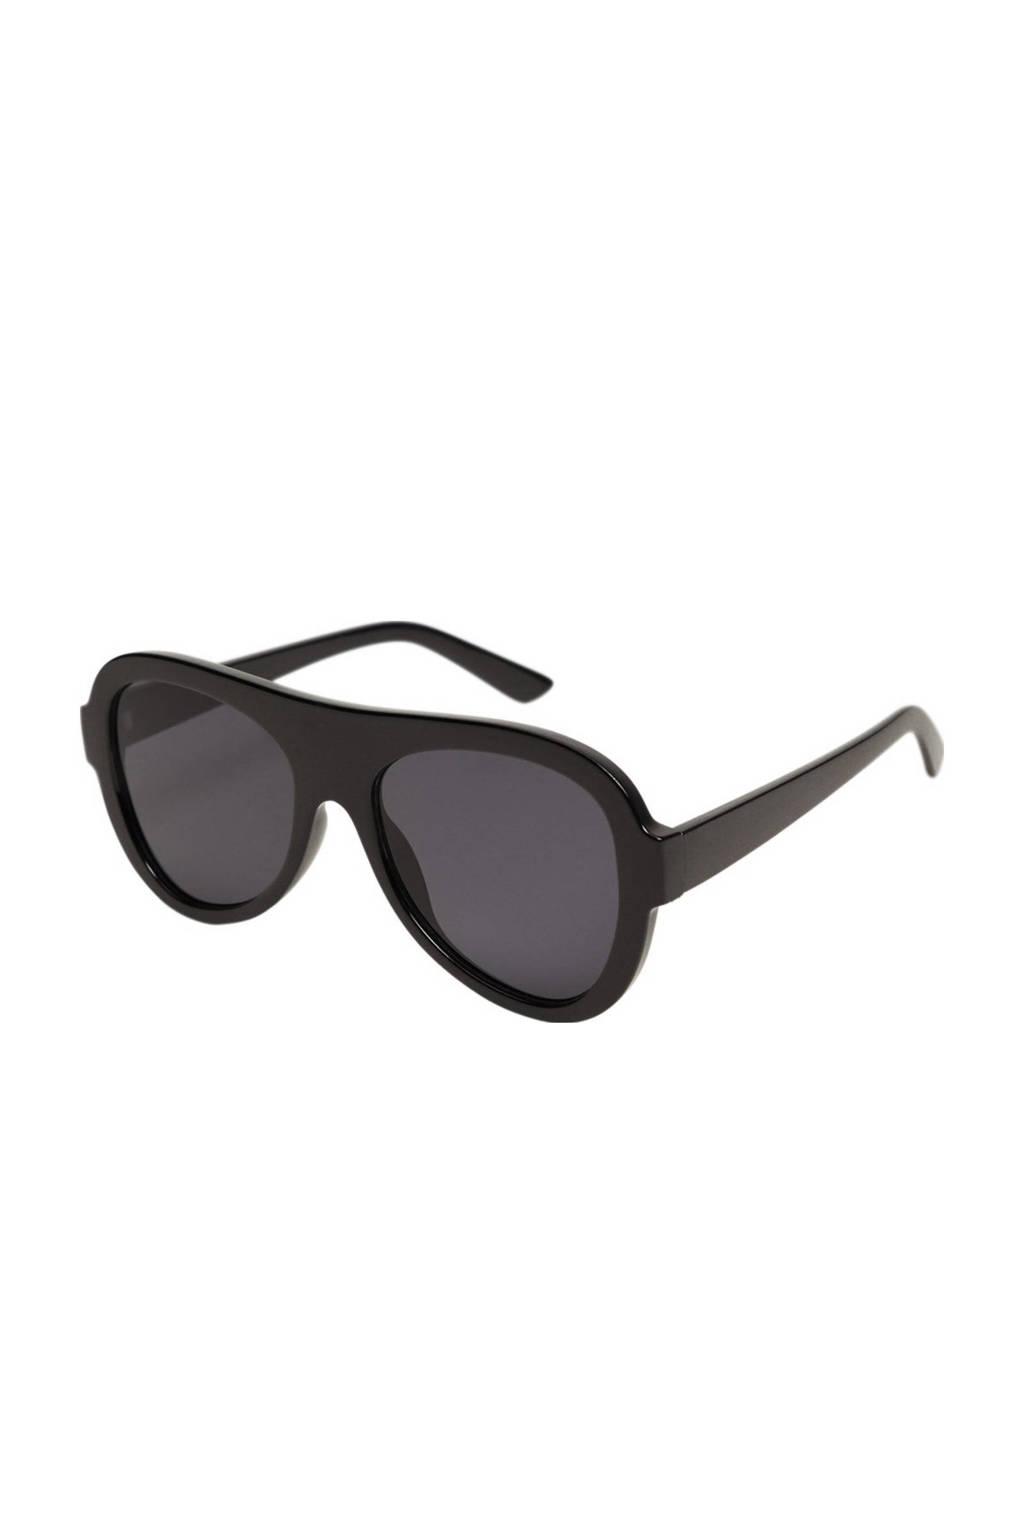 Mango zonnebril zwart